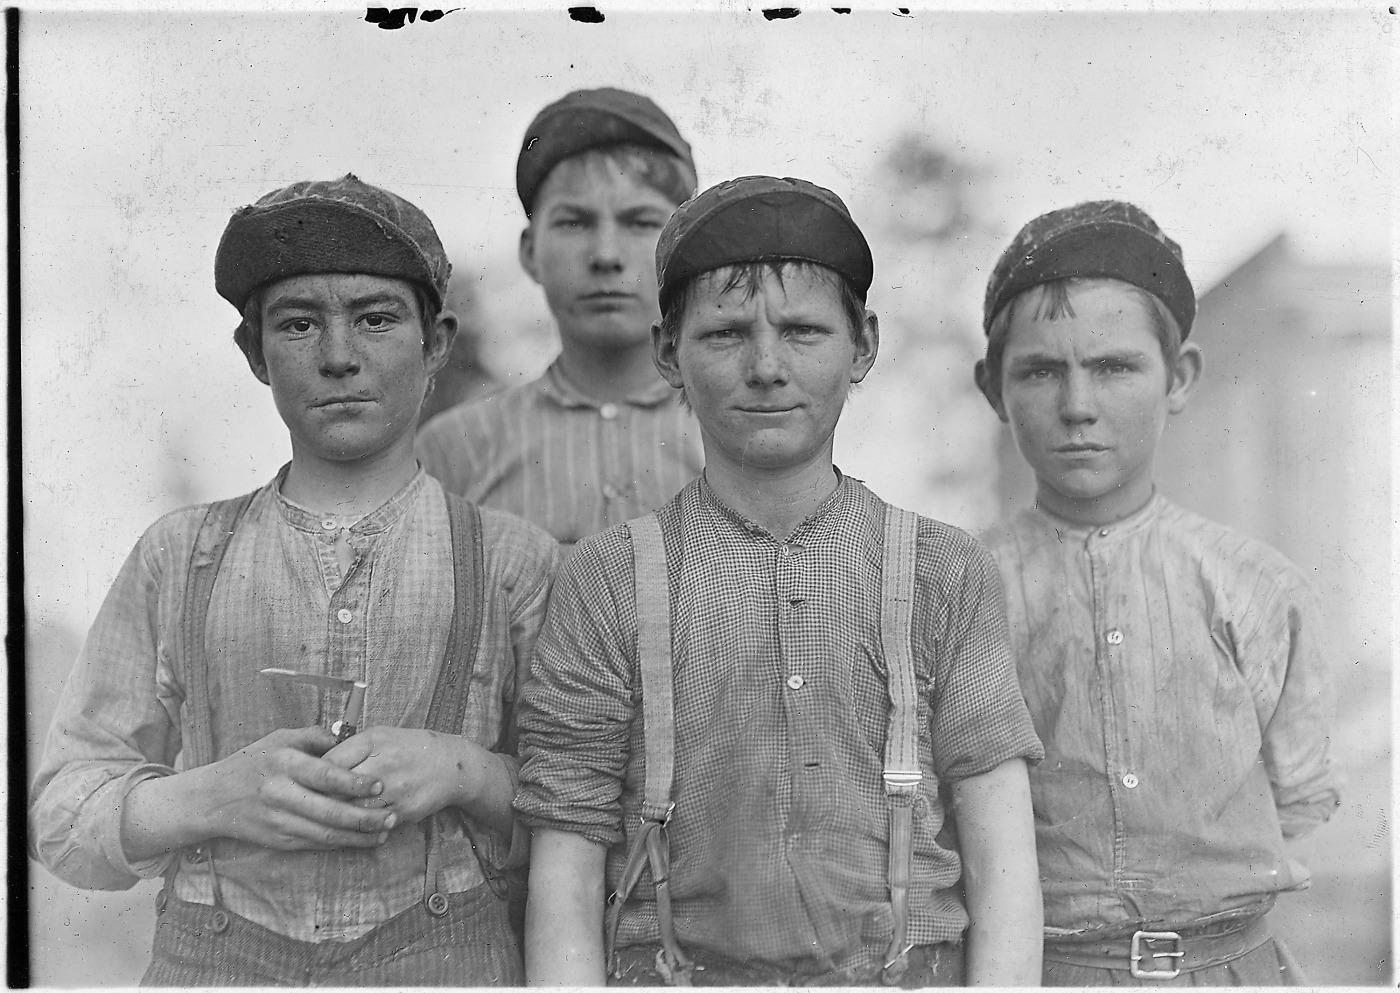 Doffer boys, Jan 1909. Public domain photo by Lewis Hine.